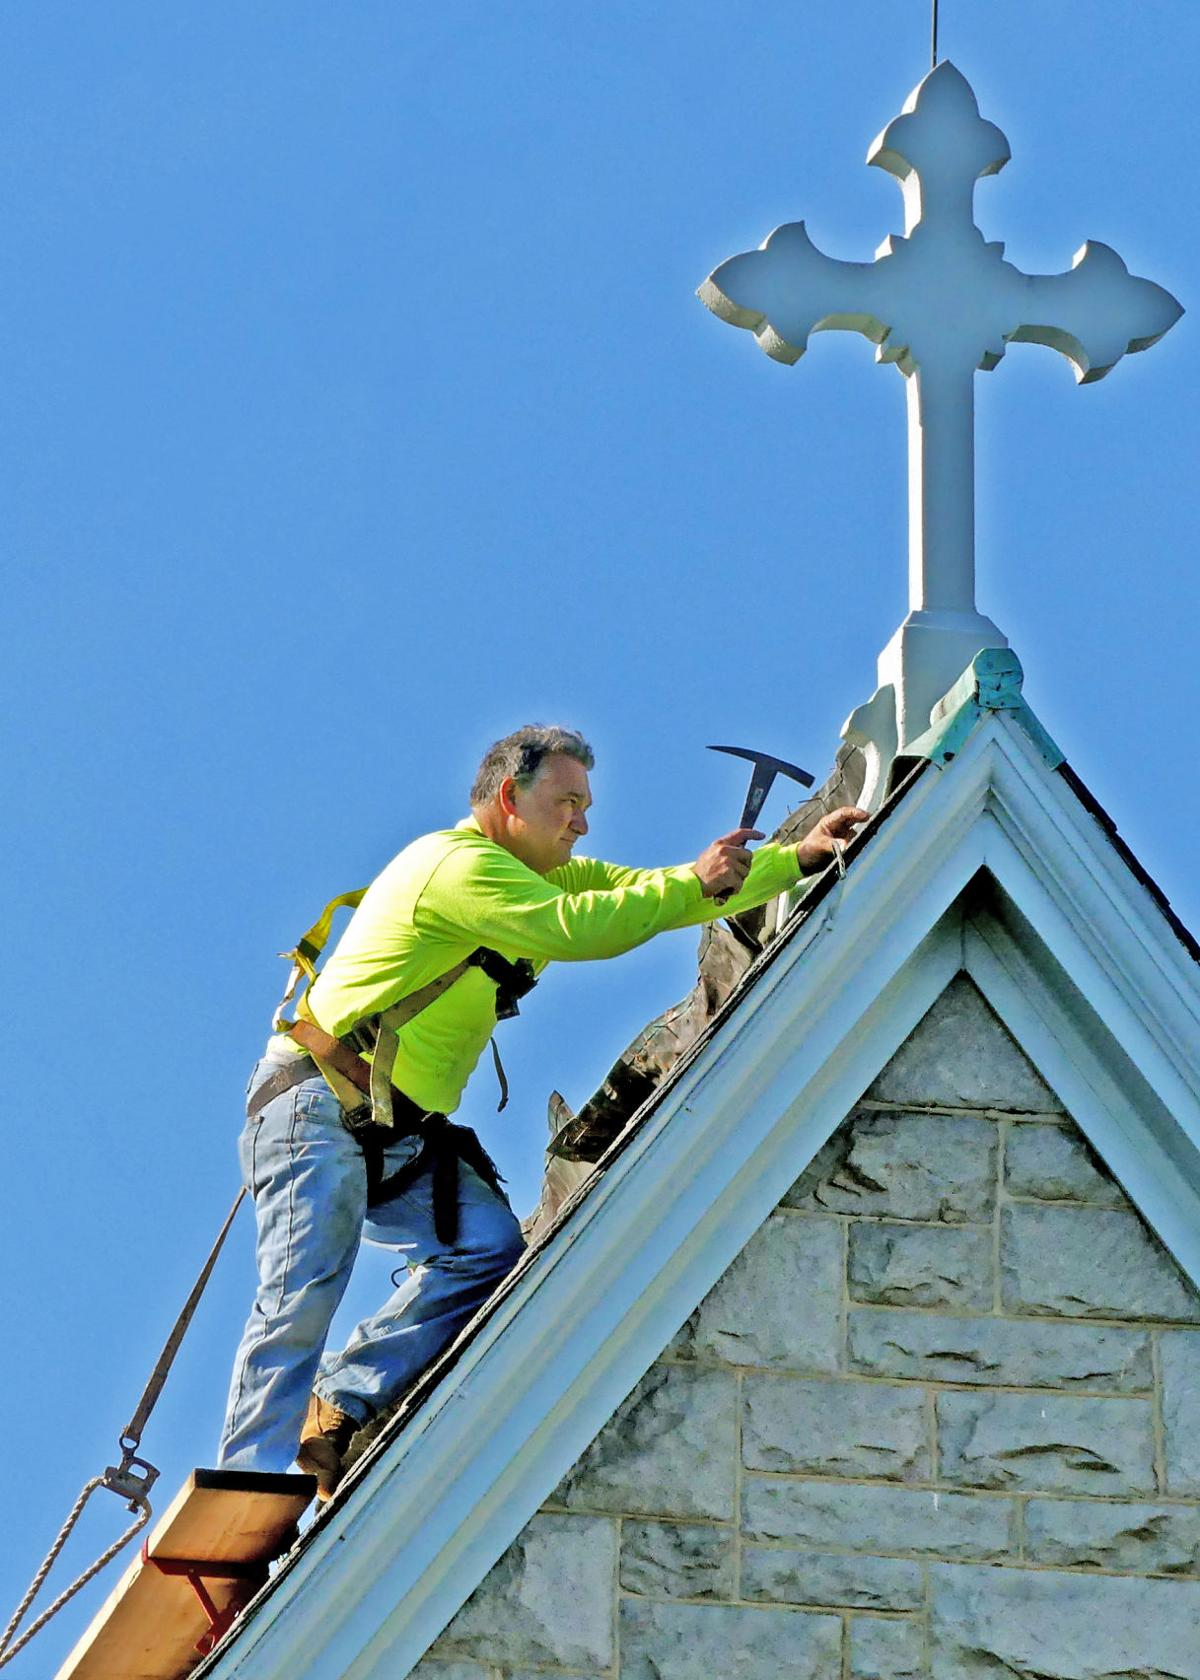 090919 WES Christ Church roof work 538.JPG